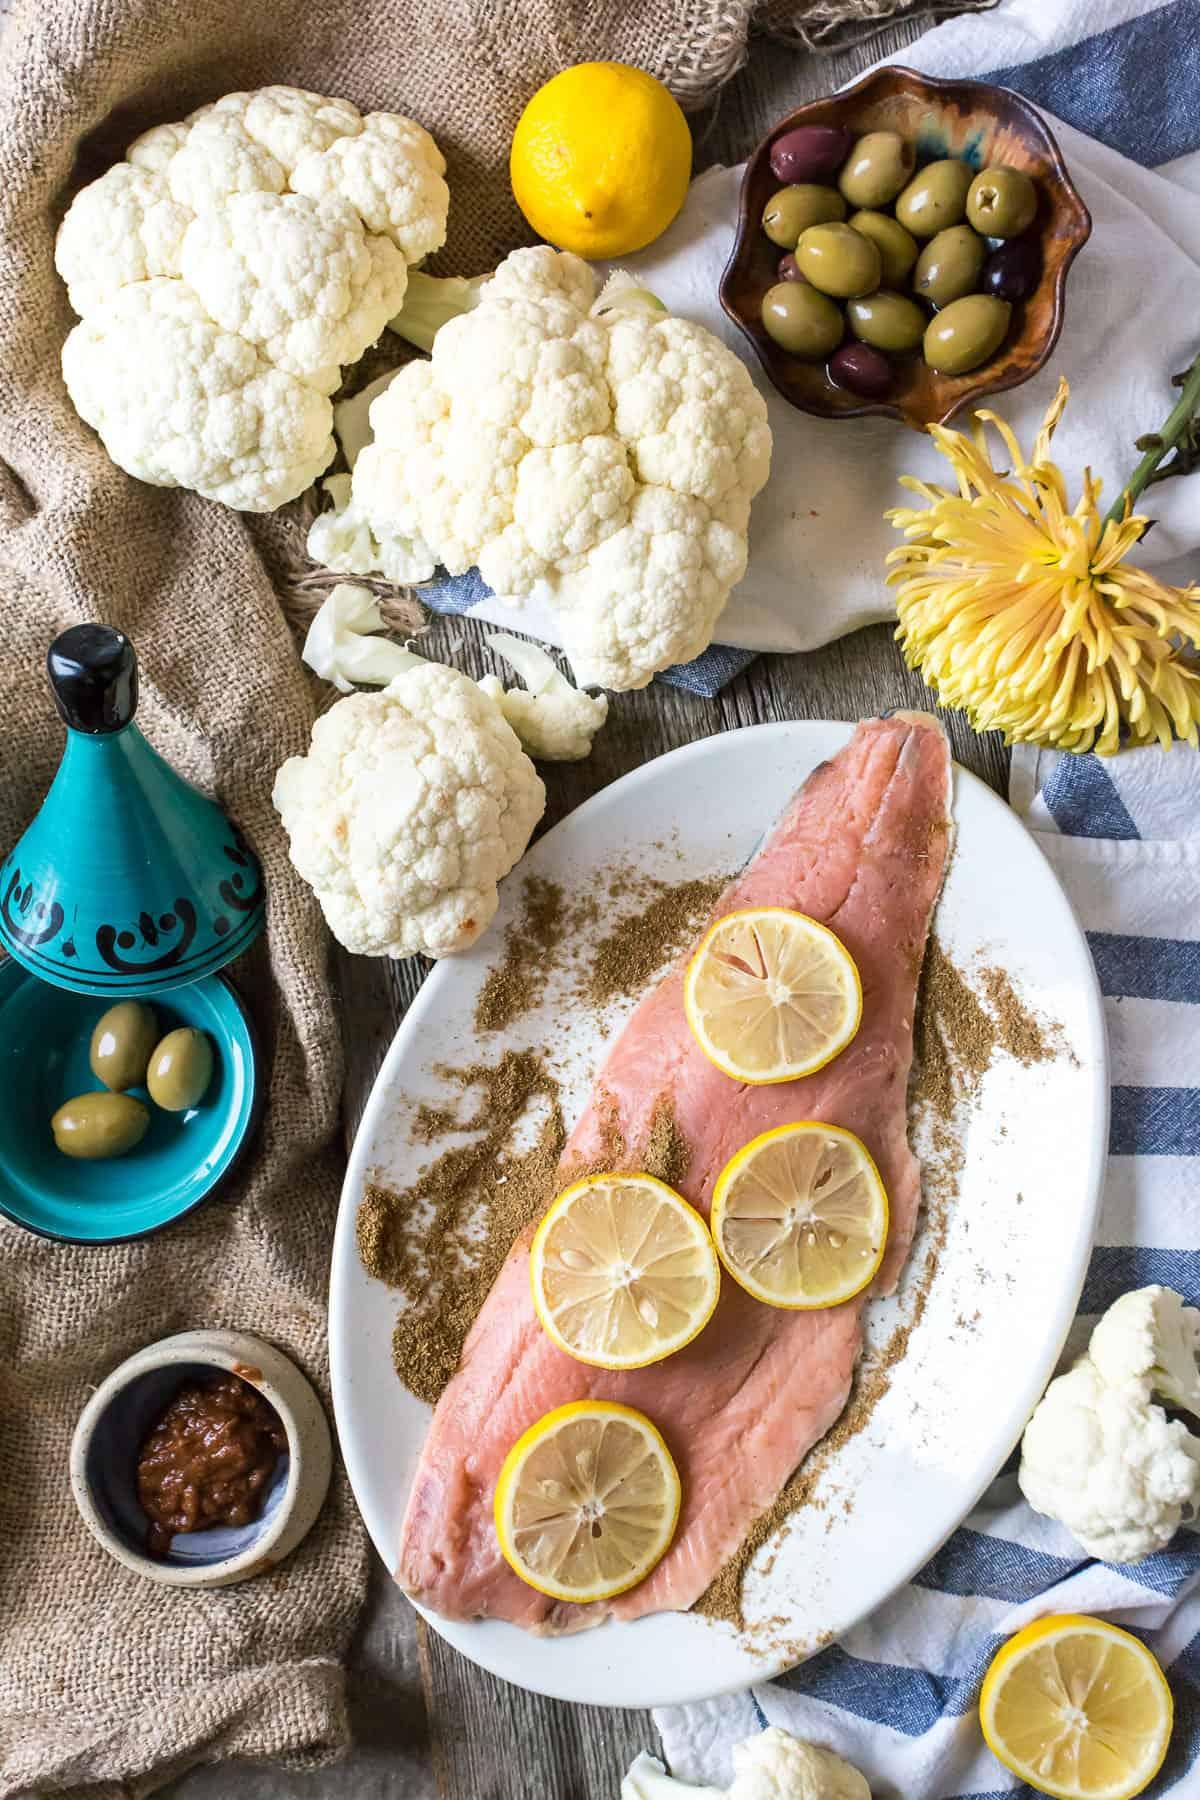 raw salmon with lemon slices